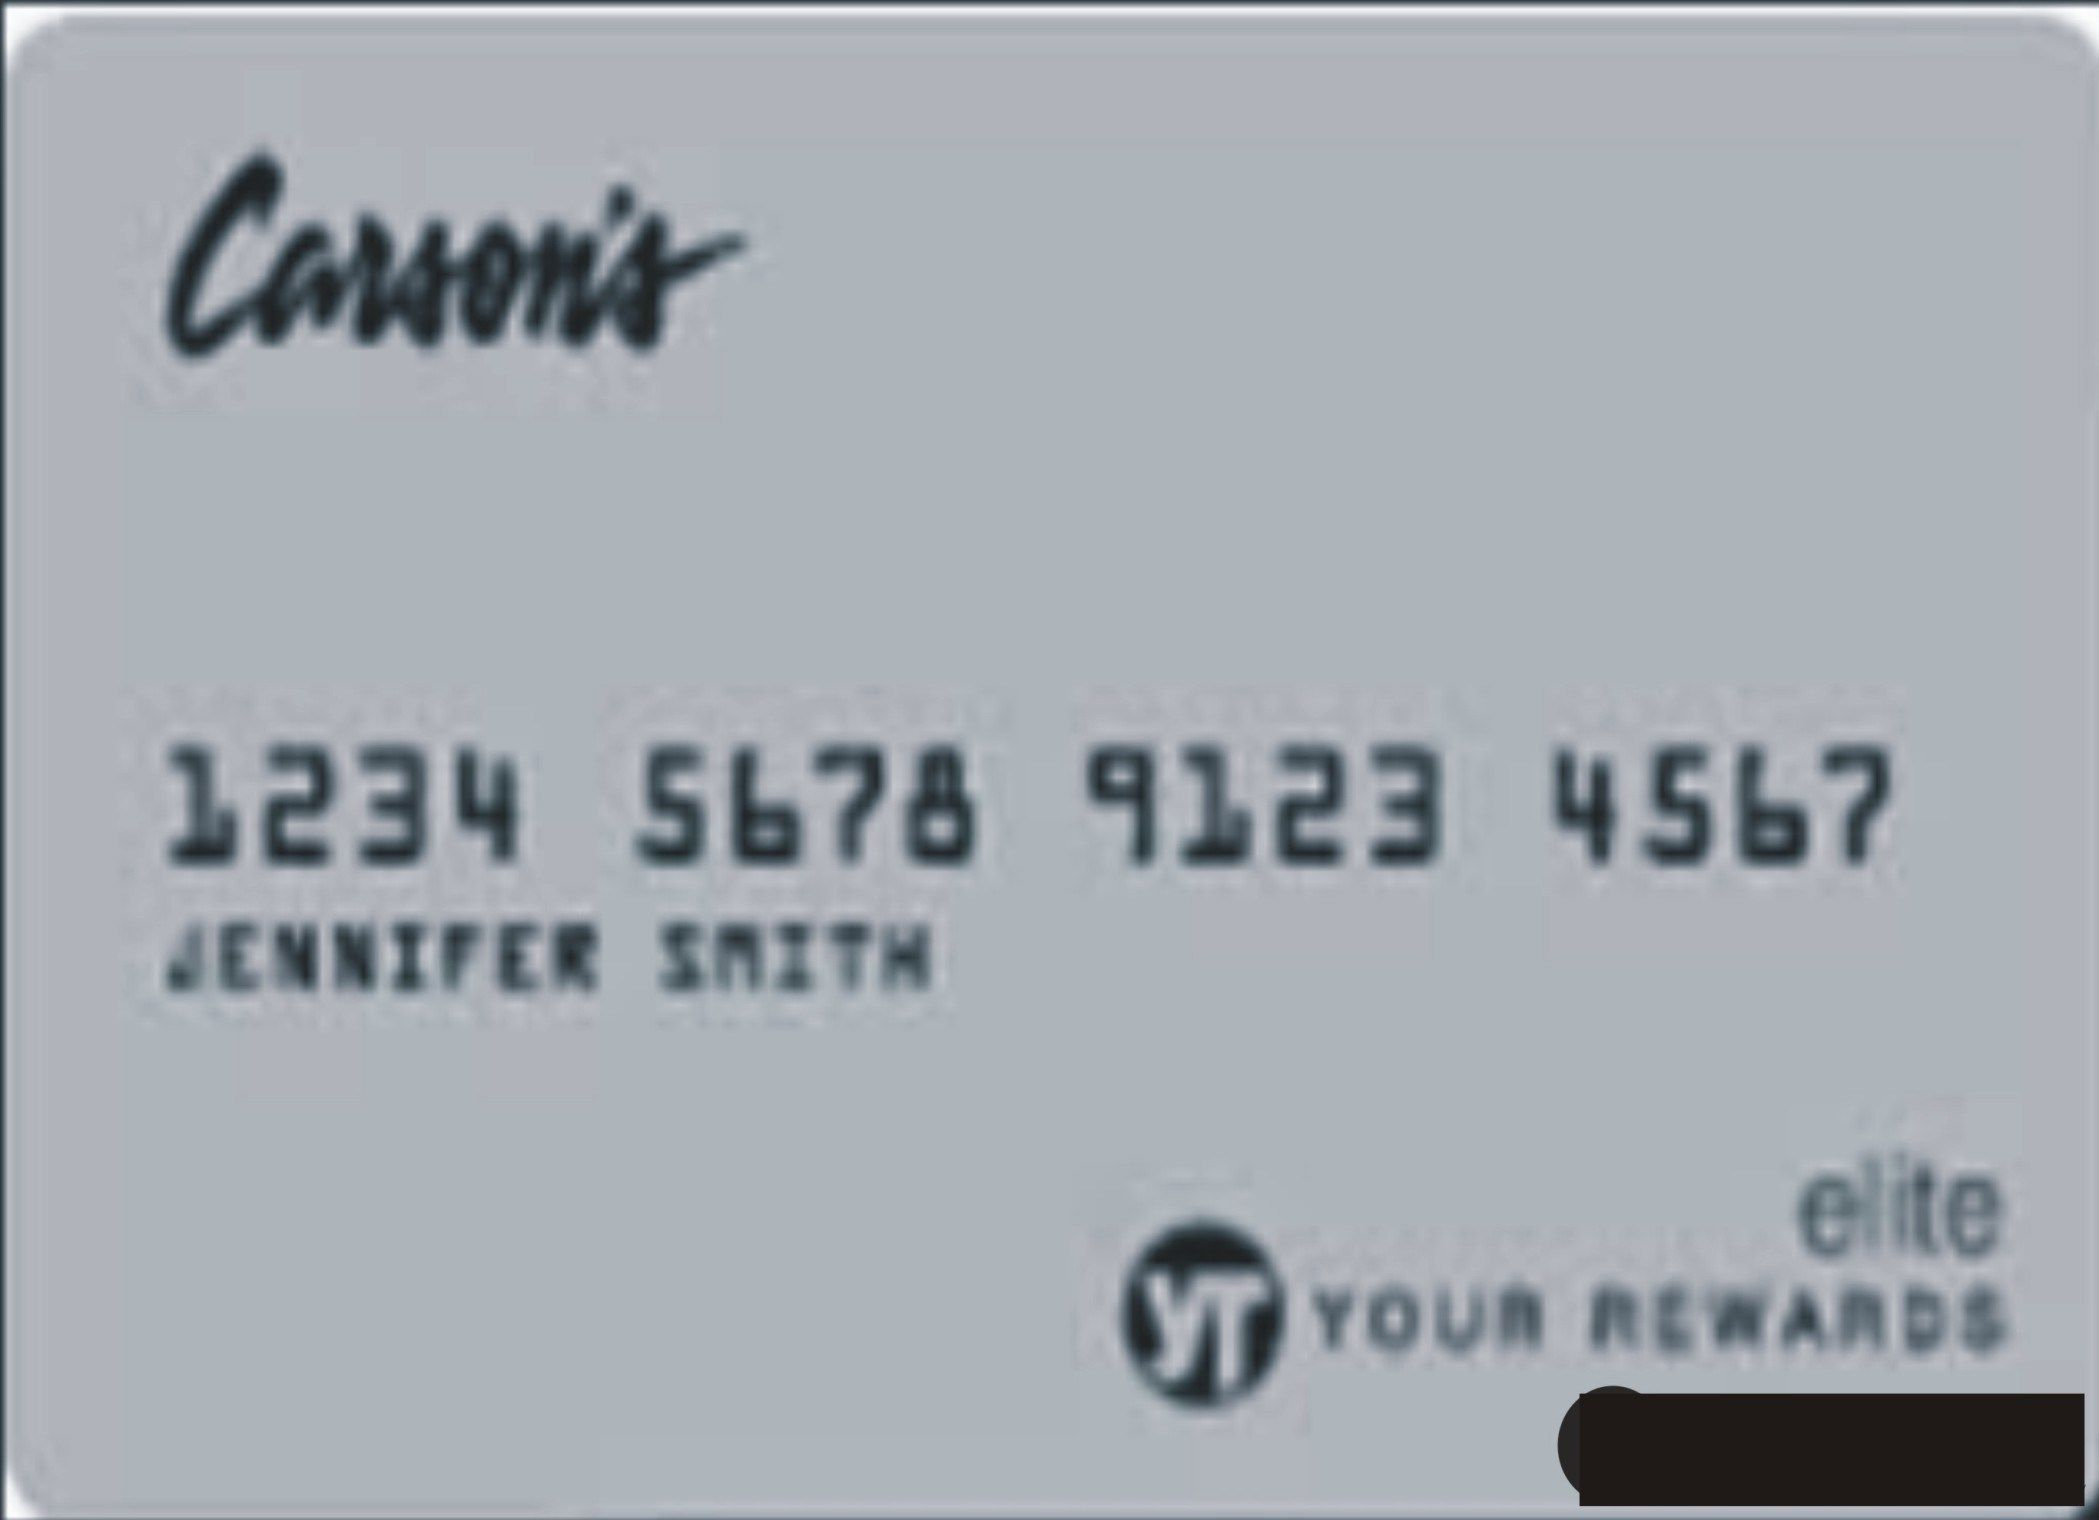 Carsonssecuredrewardscreditcardlogin rewards credit